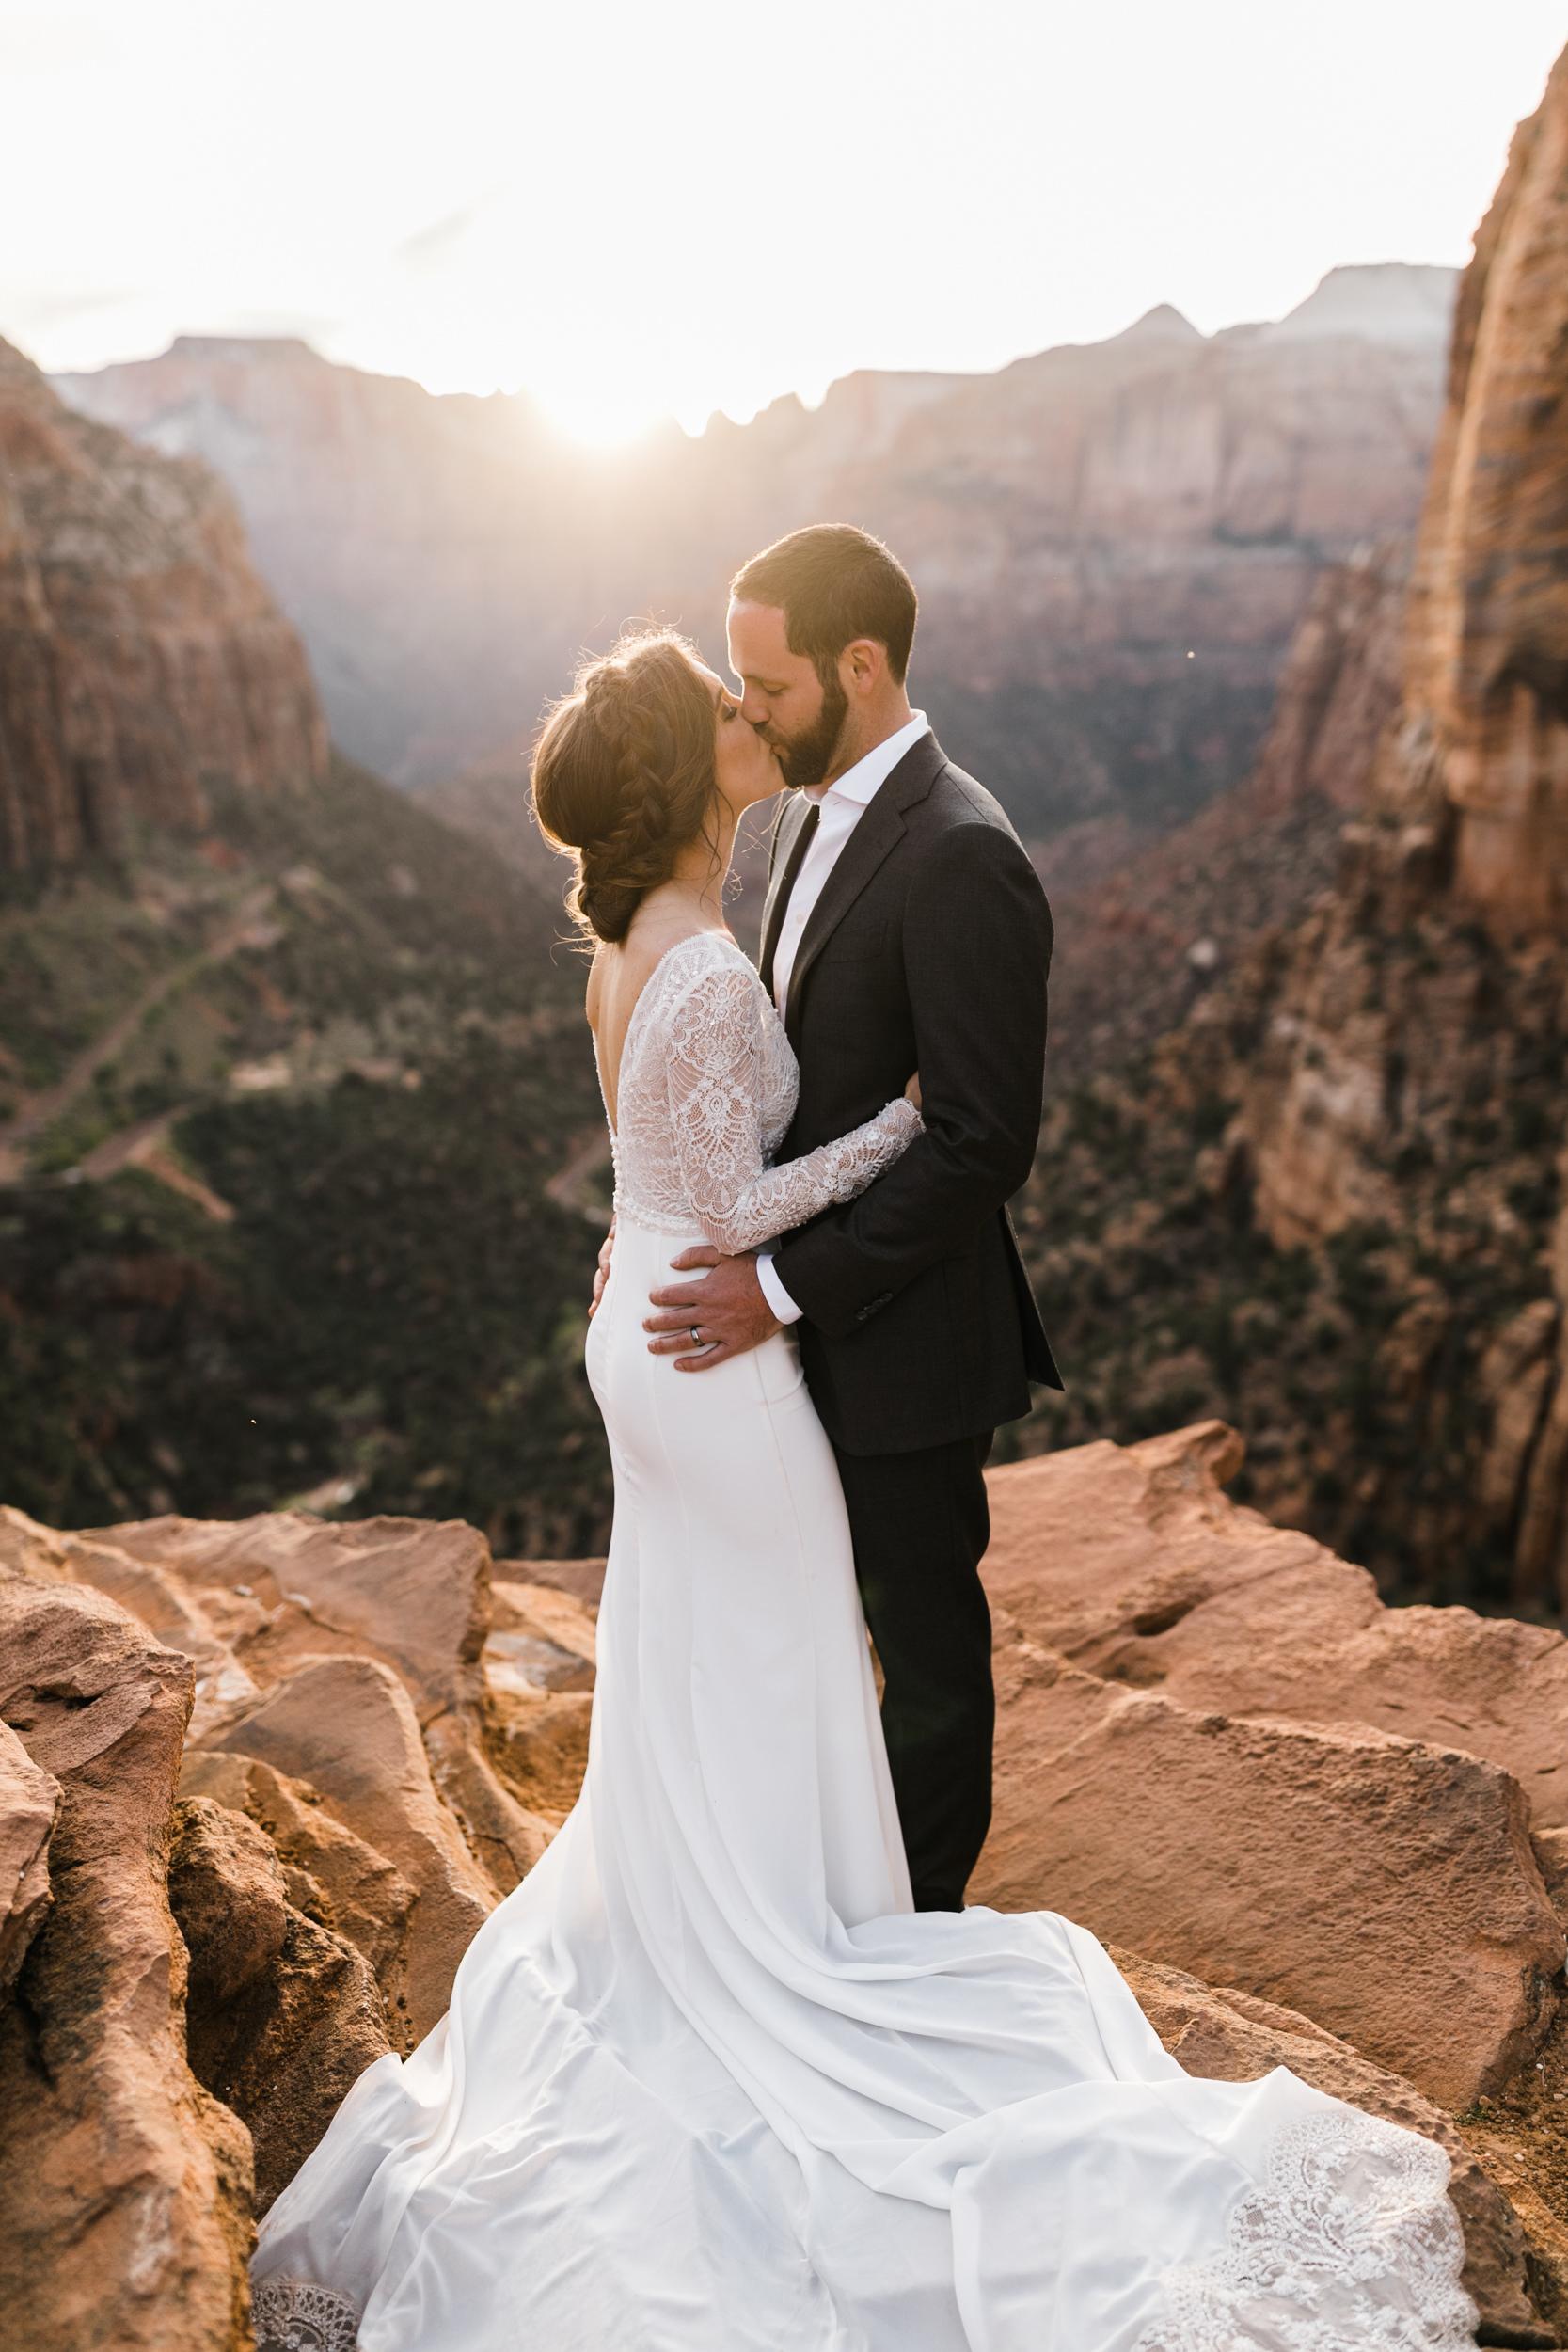 Zion-National-Park-Adventure-Wedding-Hearnes-Elopement-Photography-47.jpg